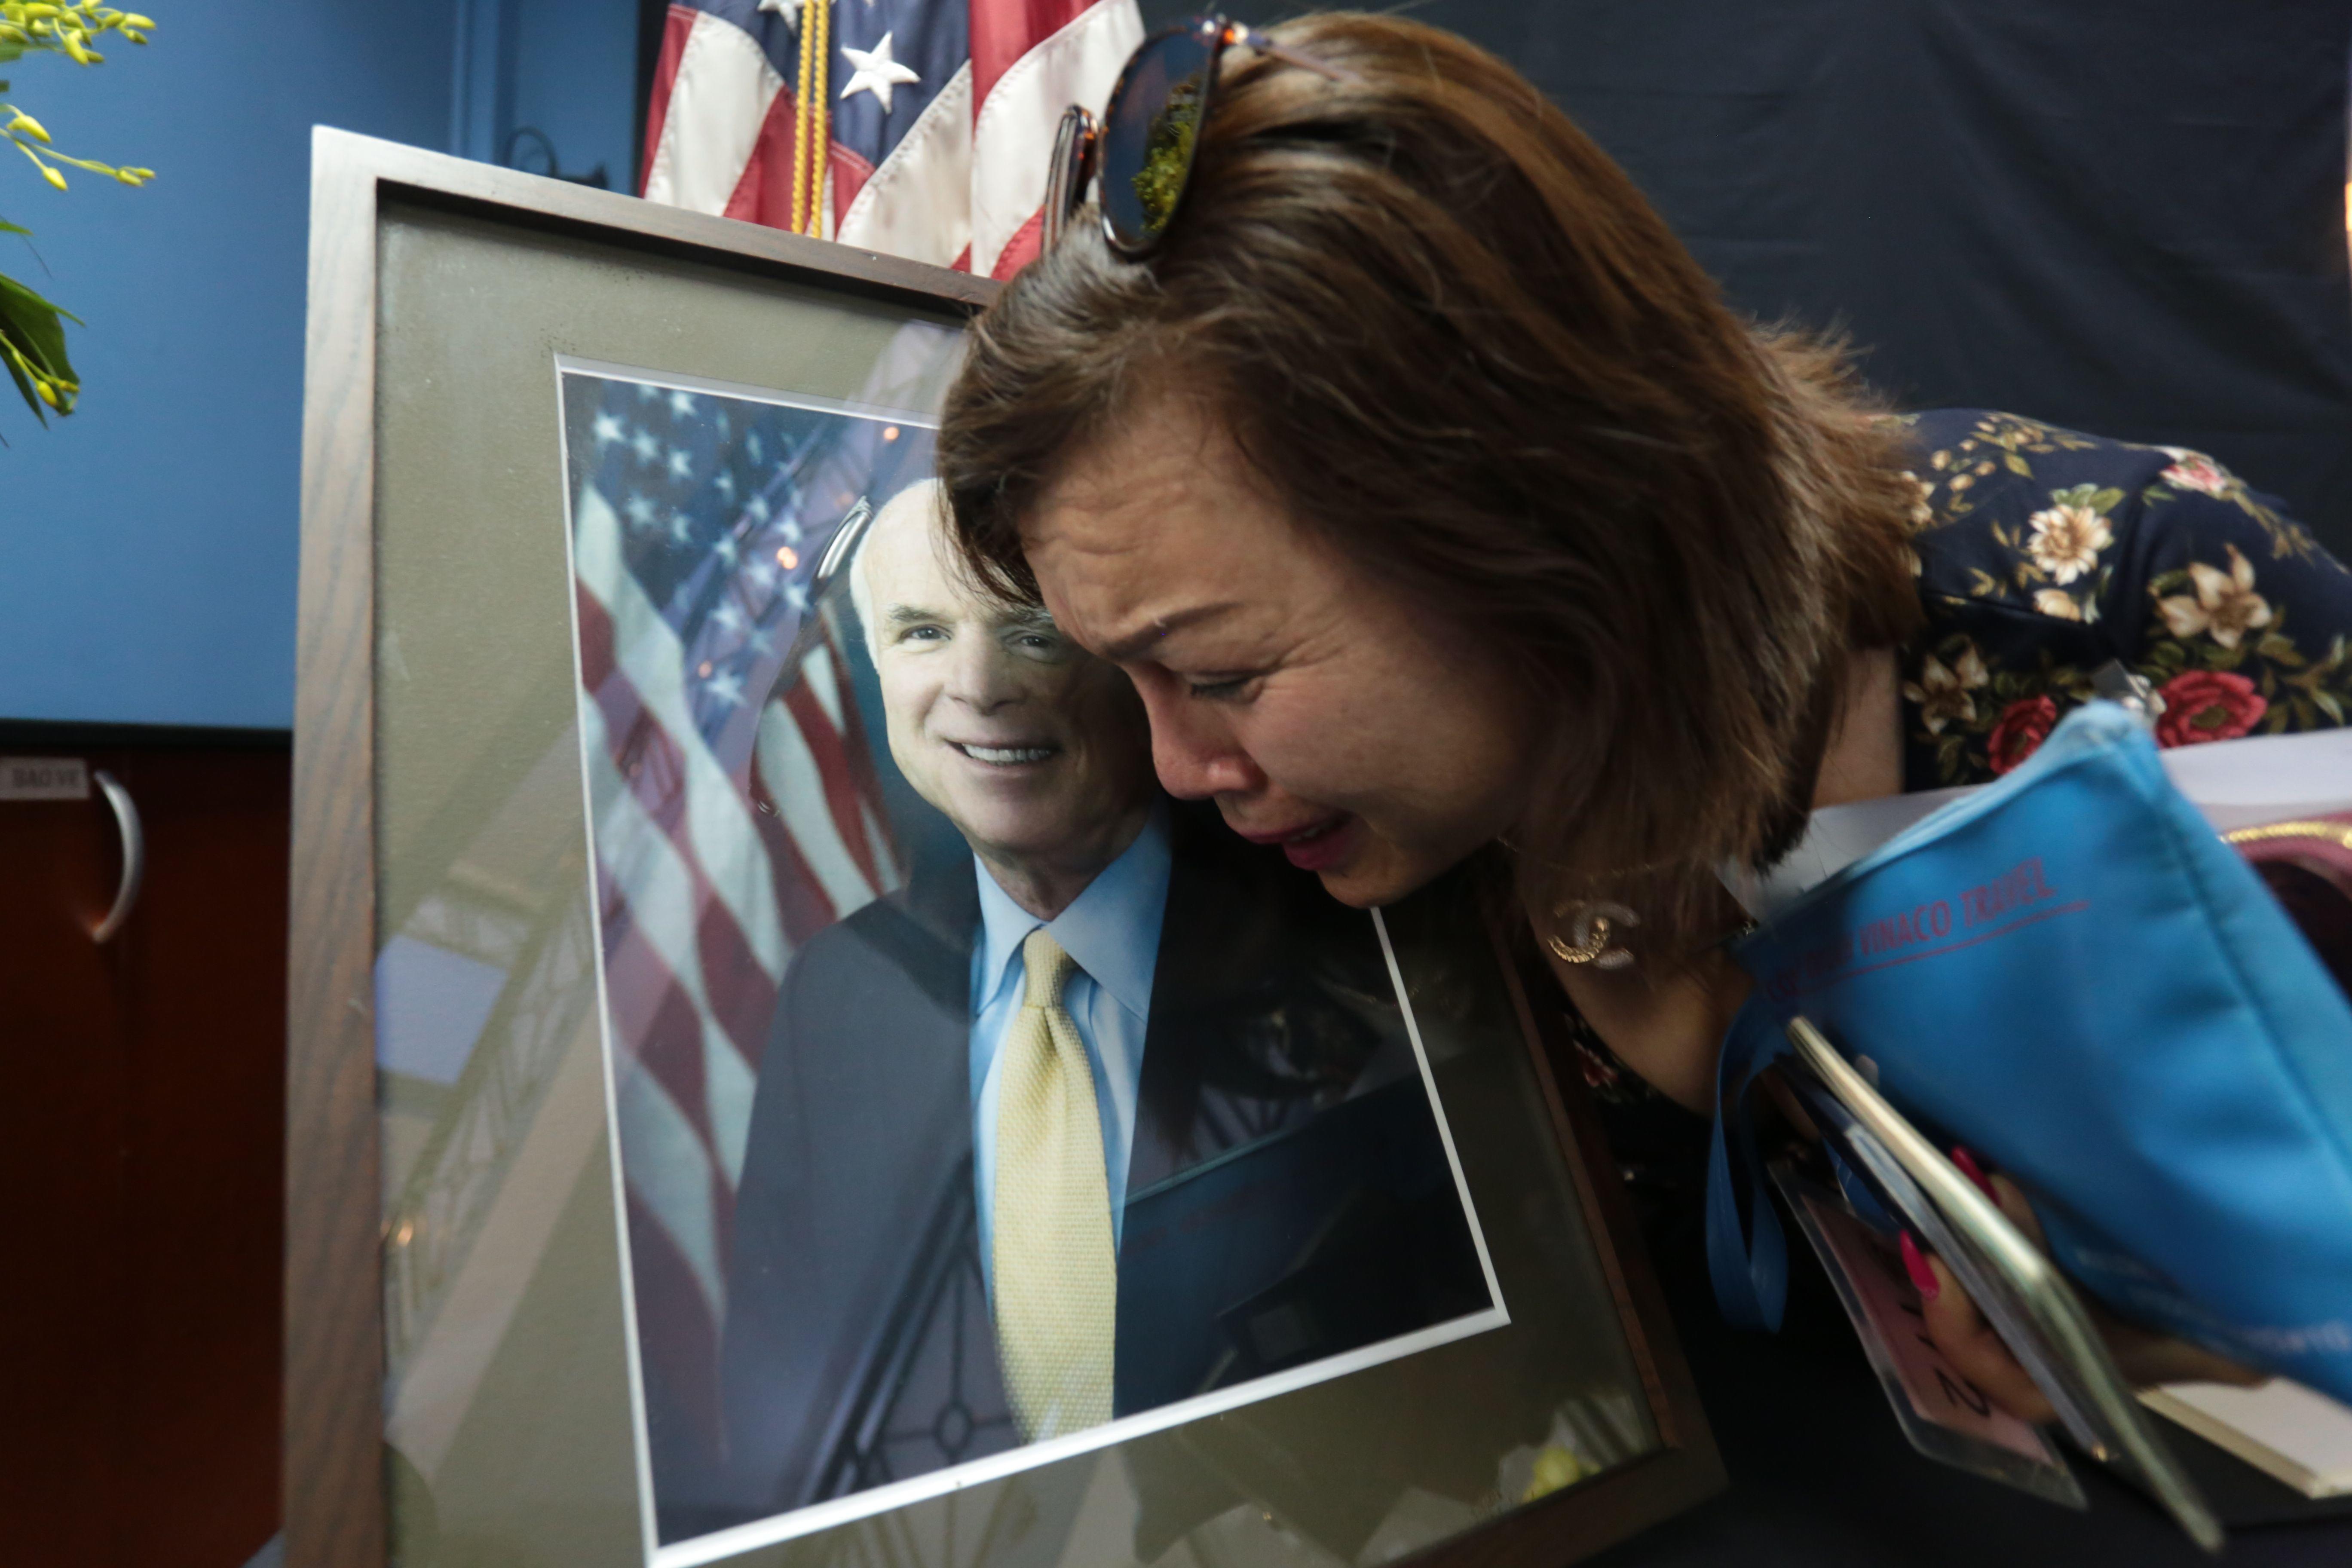 Vietnamese pay tribute to John McCain - CBS News